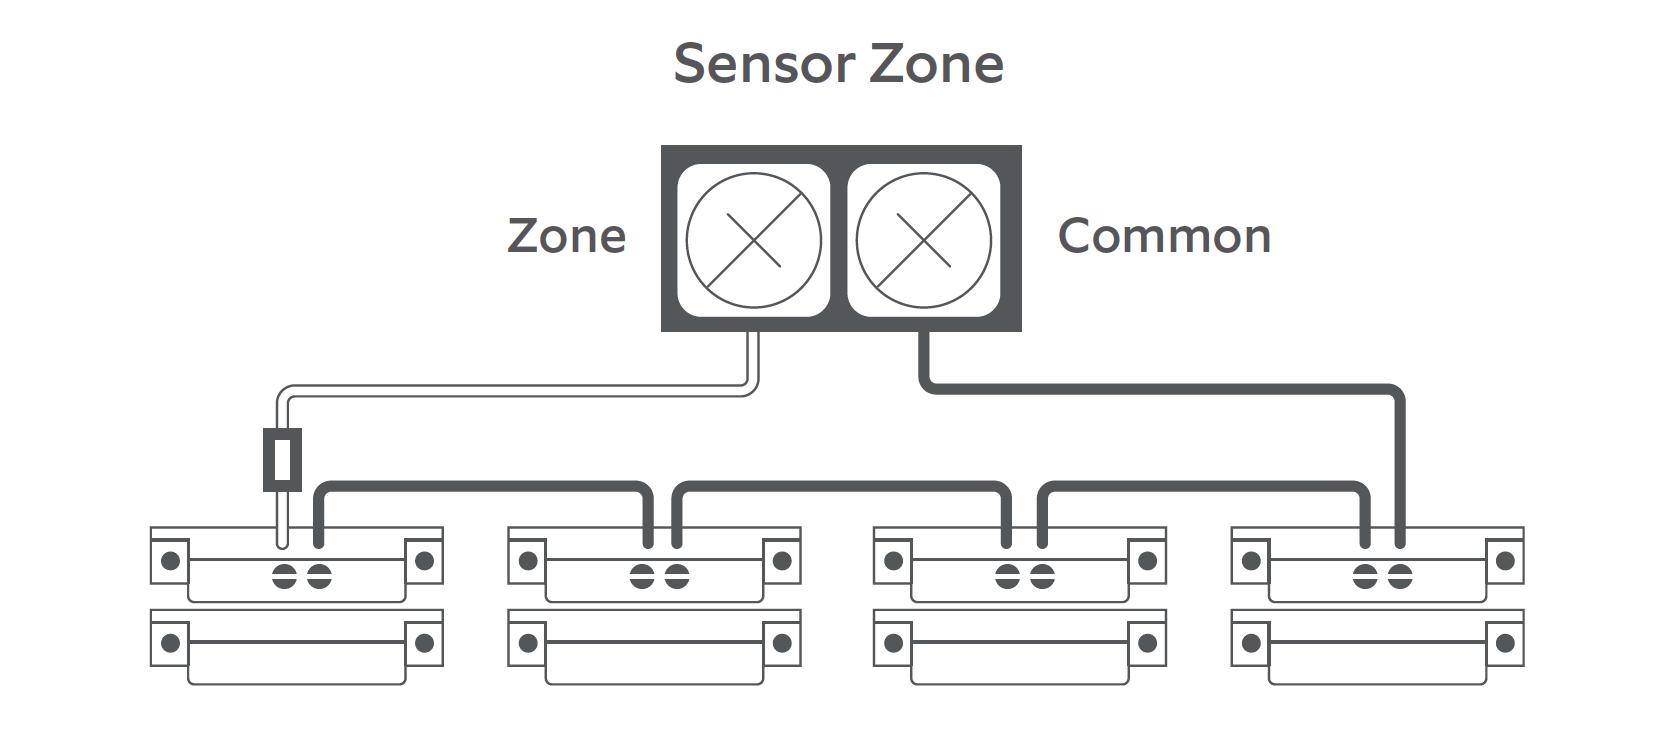 common house wiring alarm anatomy of a wired alarm panel retrofit alarm kit     ring help  anatomy of a wired alarm panel